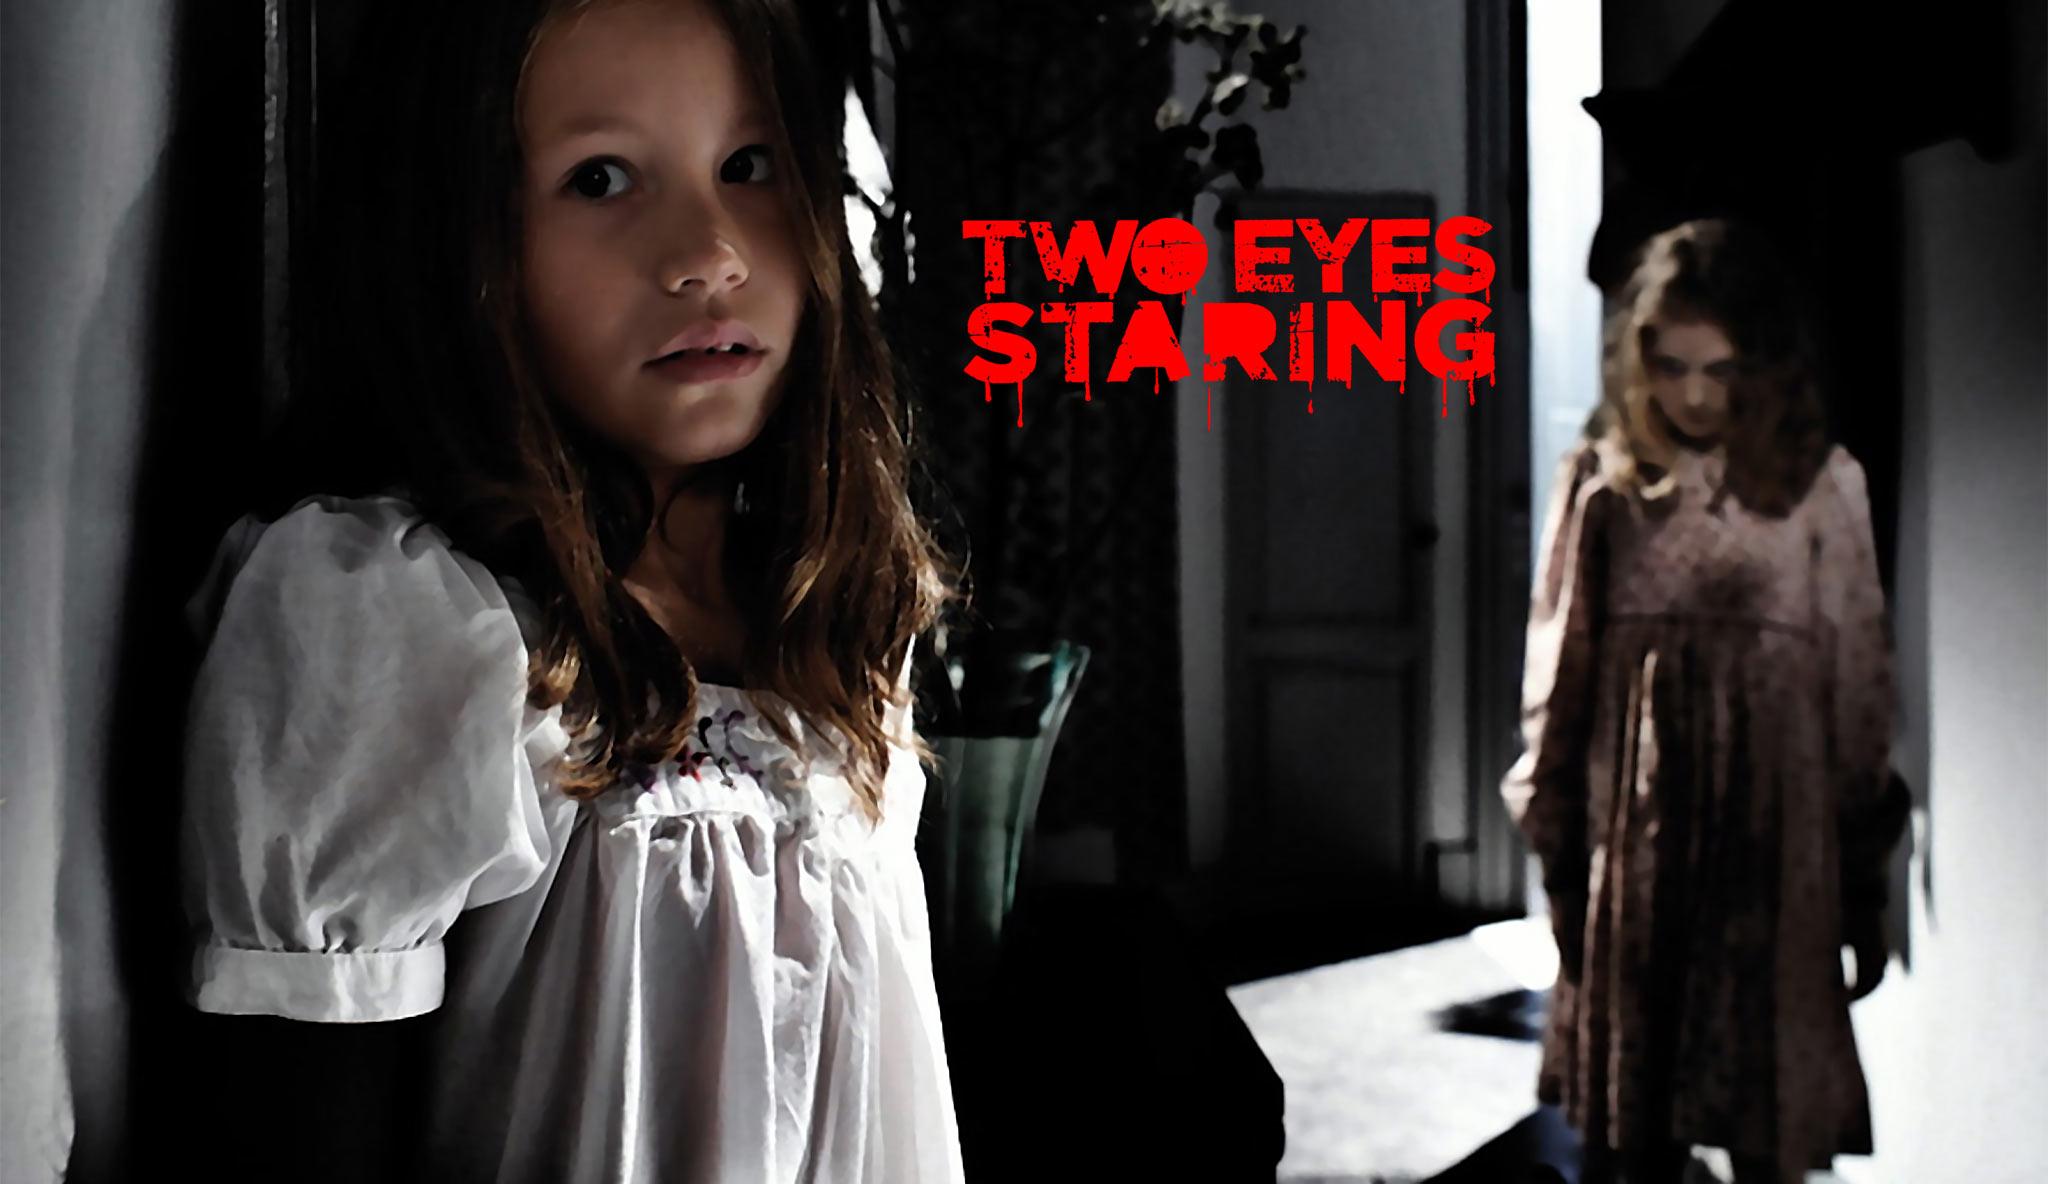 sinister-encounters-two-eyes-staring\header.jpg